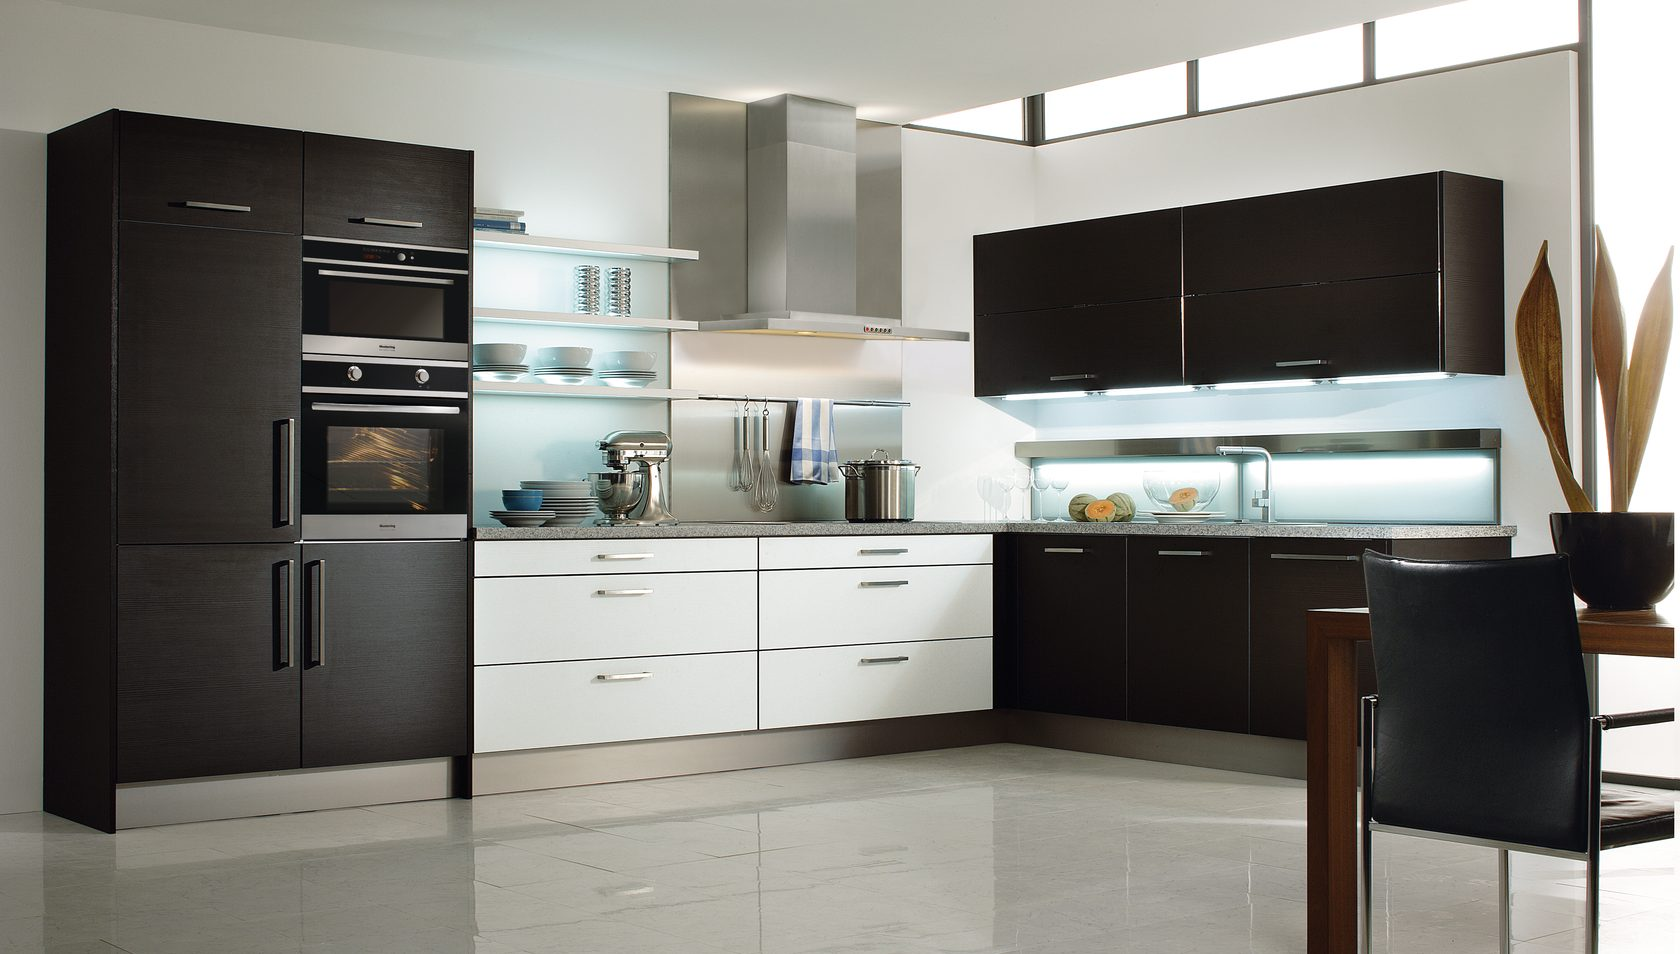 haus garten m bel in werl infobel deutschland. Black Bedroom Furniture Sets. Home Design Ideas